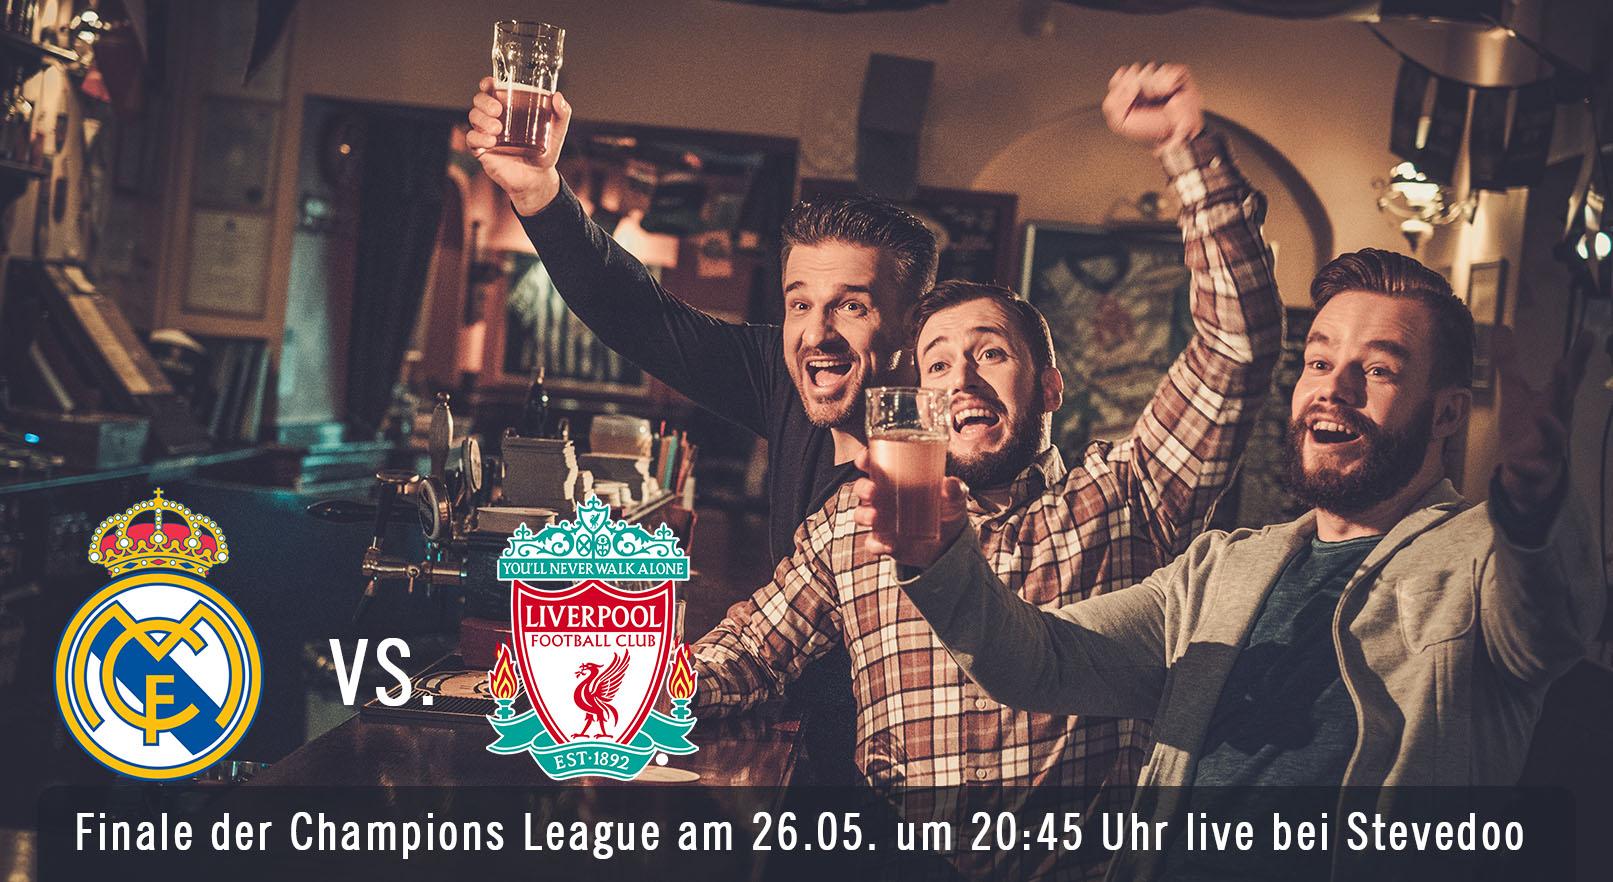 Stevedoo_Burger_Sportbar_Live -Champion League Finale-Fußball_Bar_PartyFrankfurt_Bundesliga live in Frankfurt_DFB Pokal